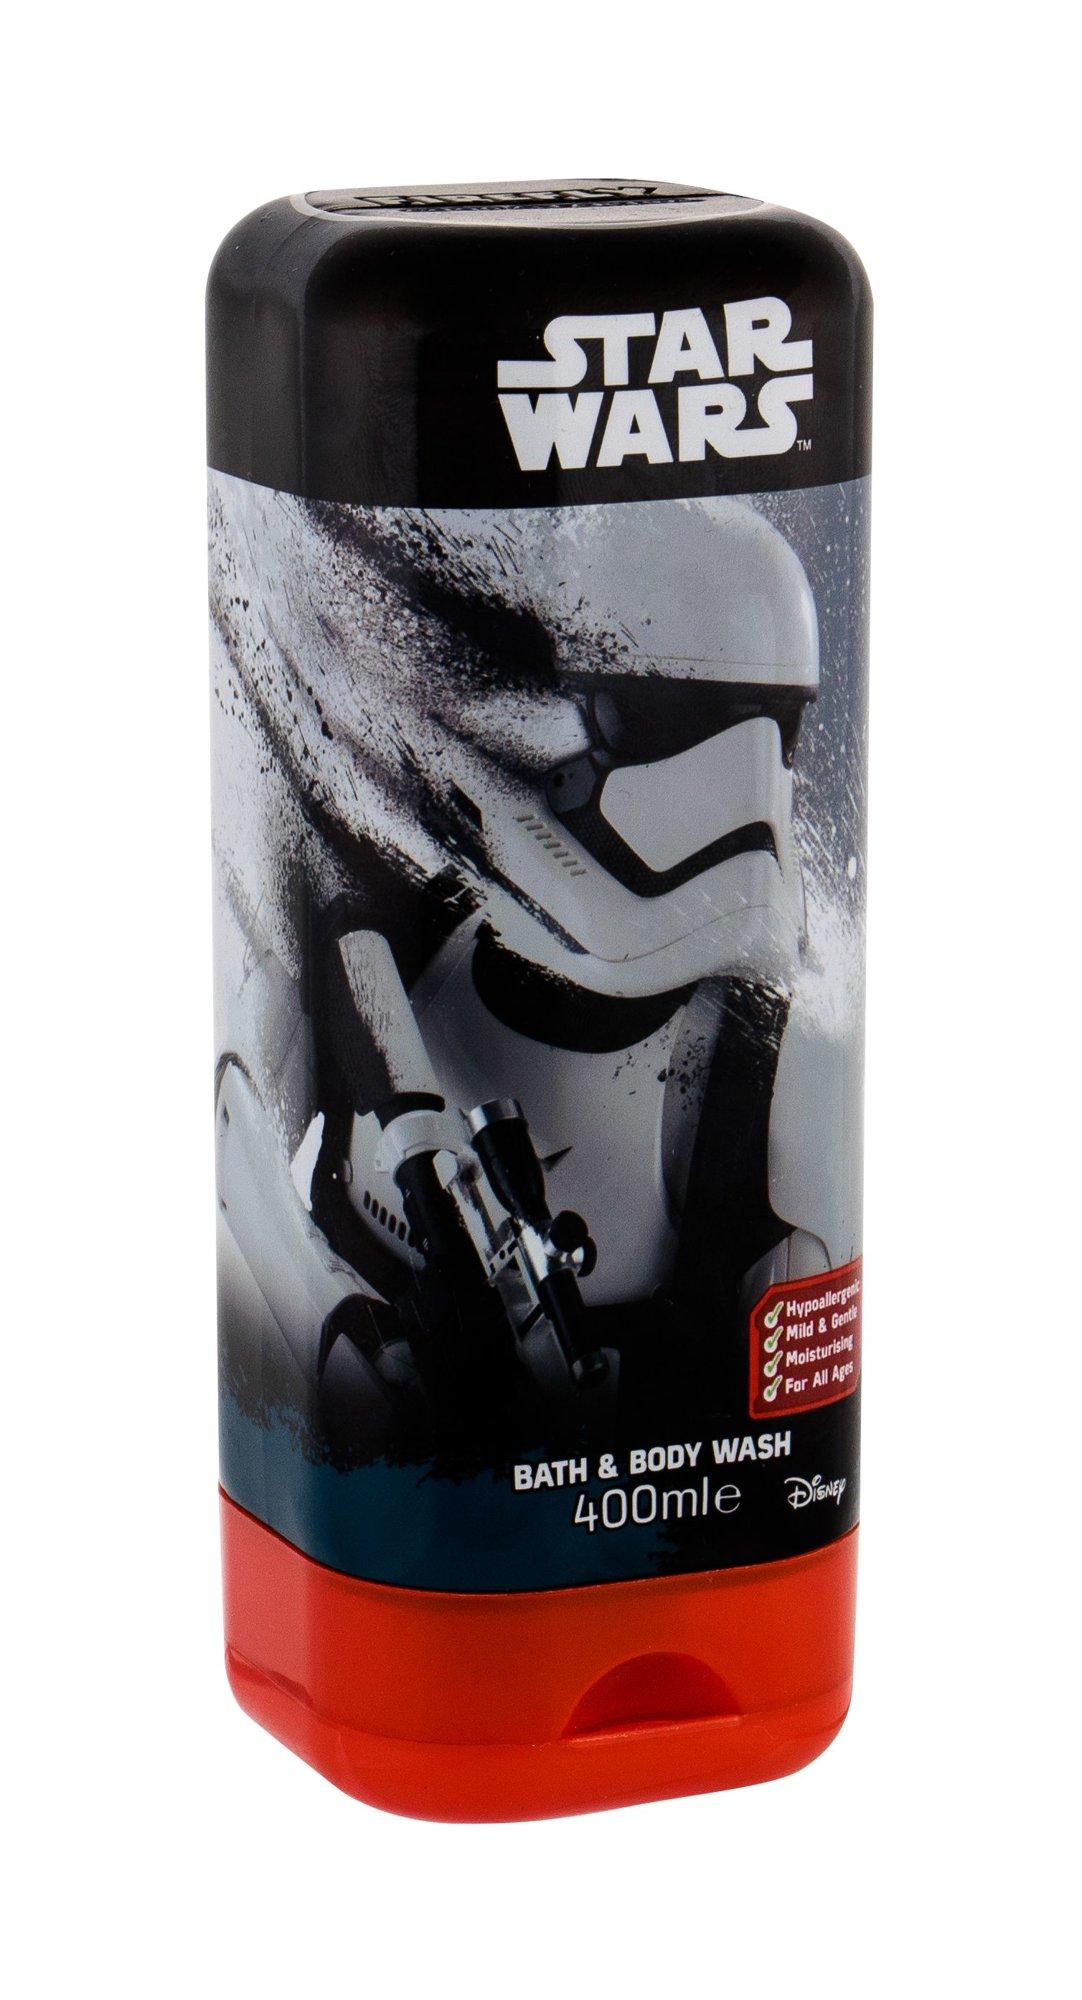 Higienos priemonė Star Wars Star Wars